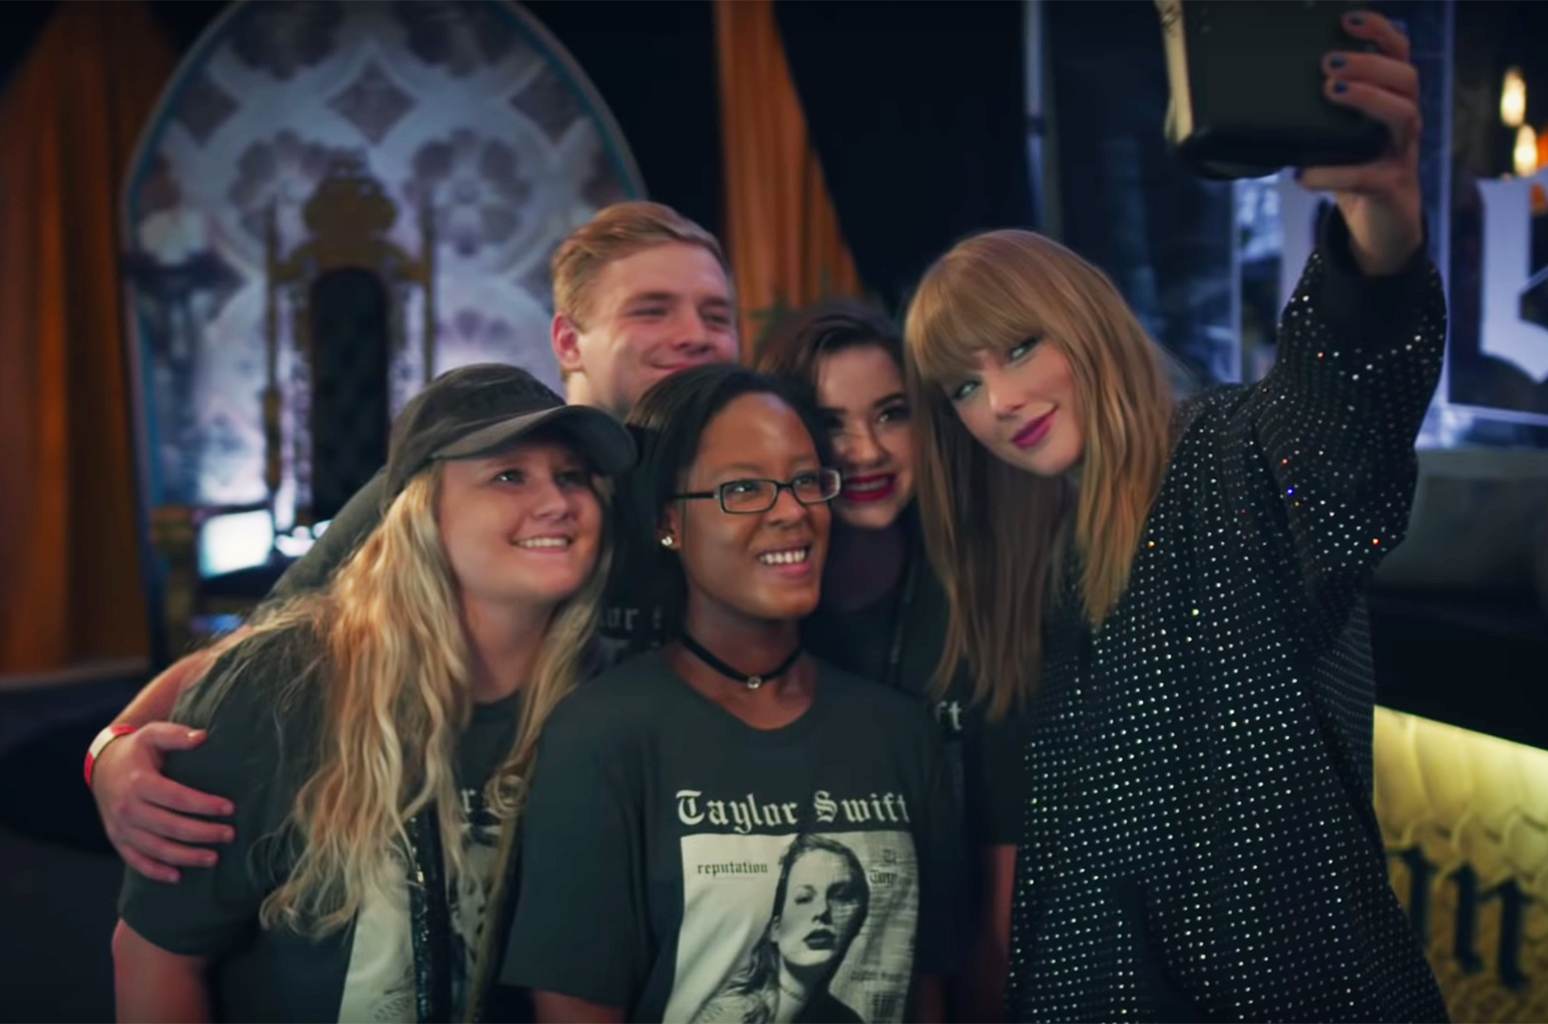 Taylor's New Camera